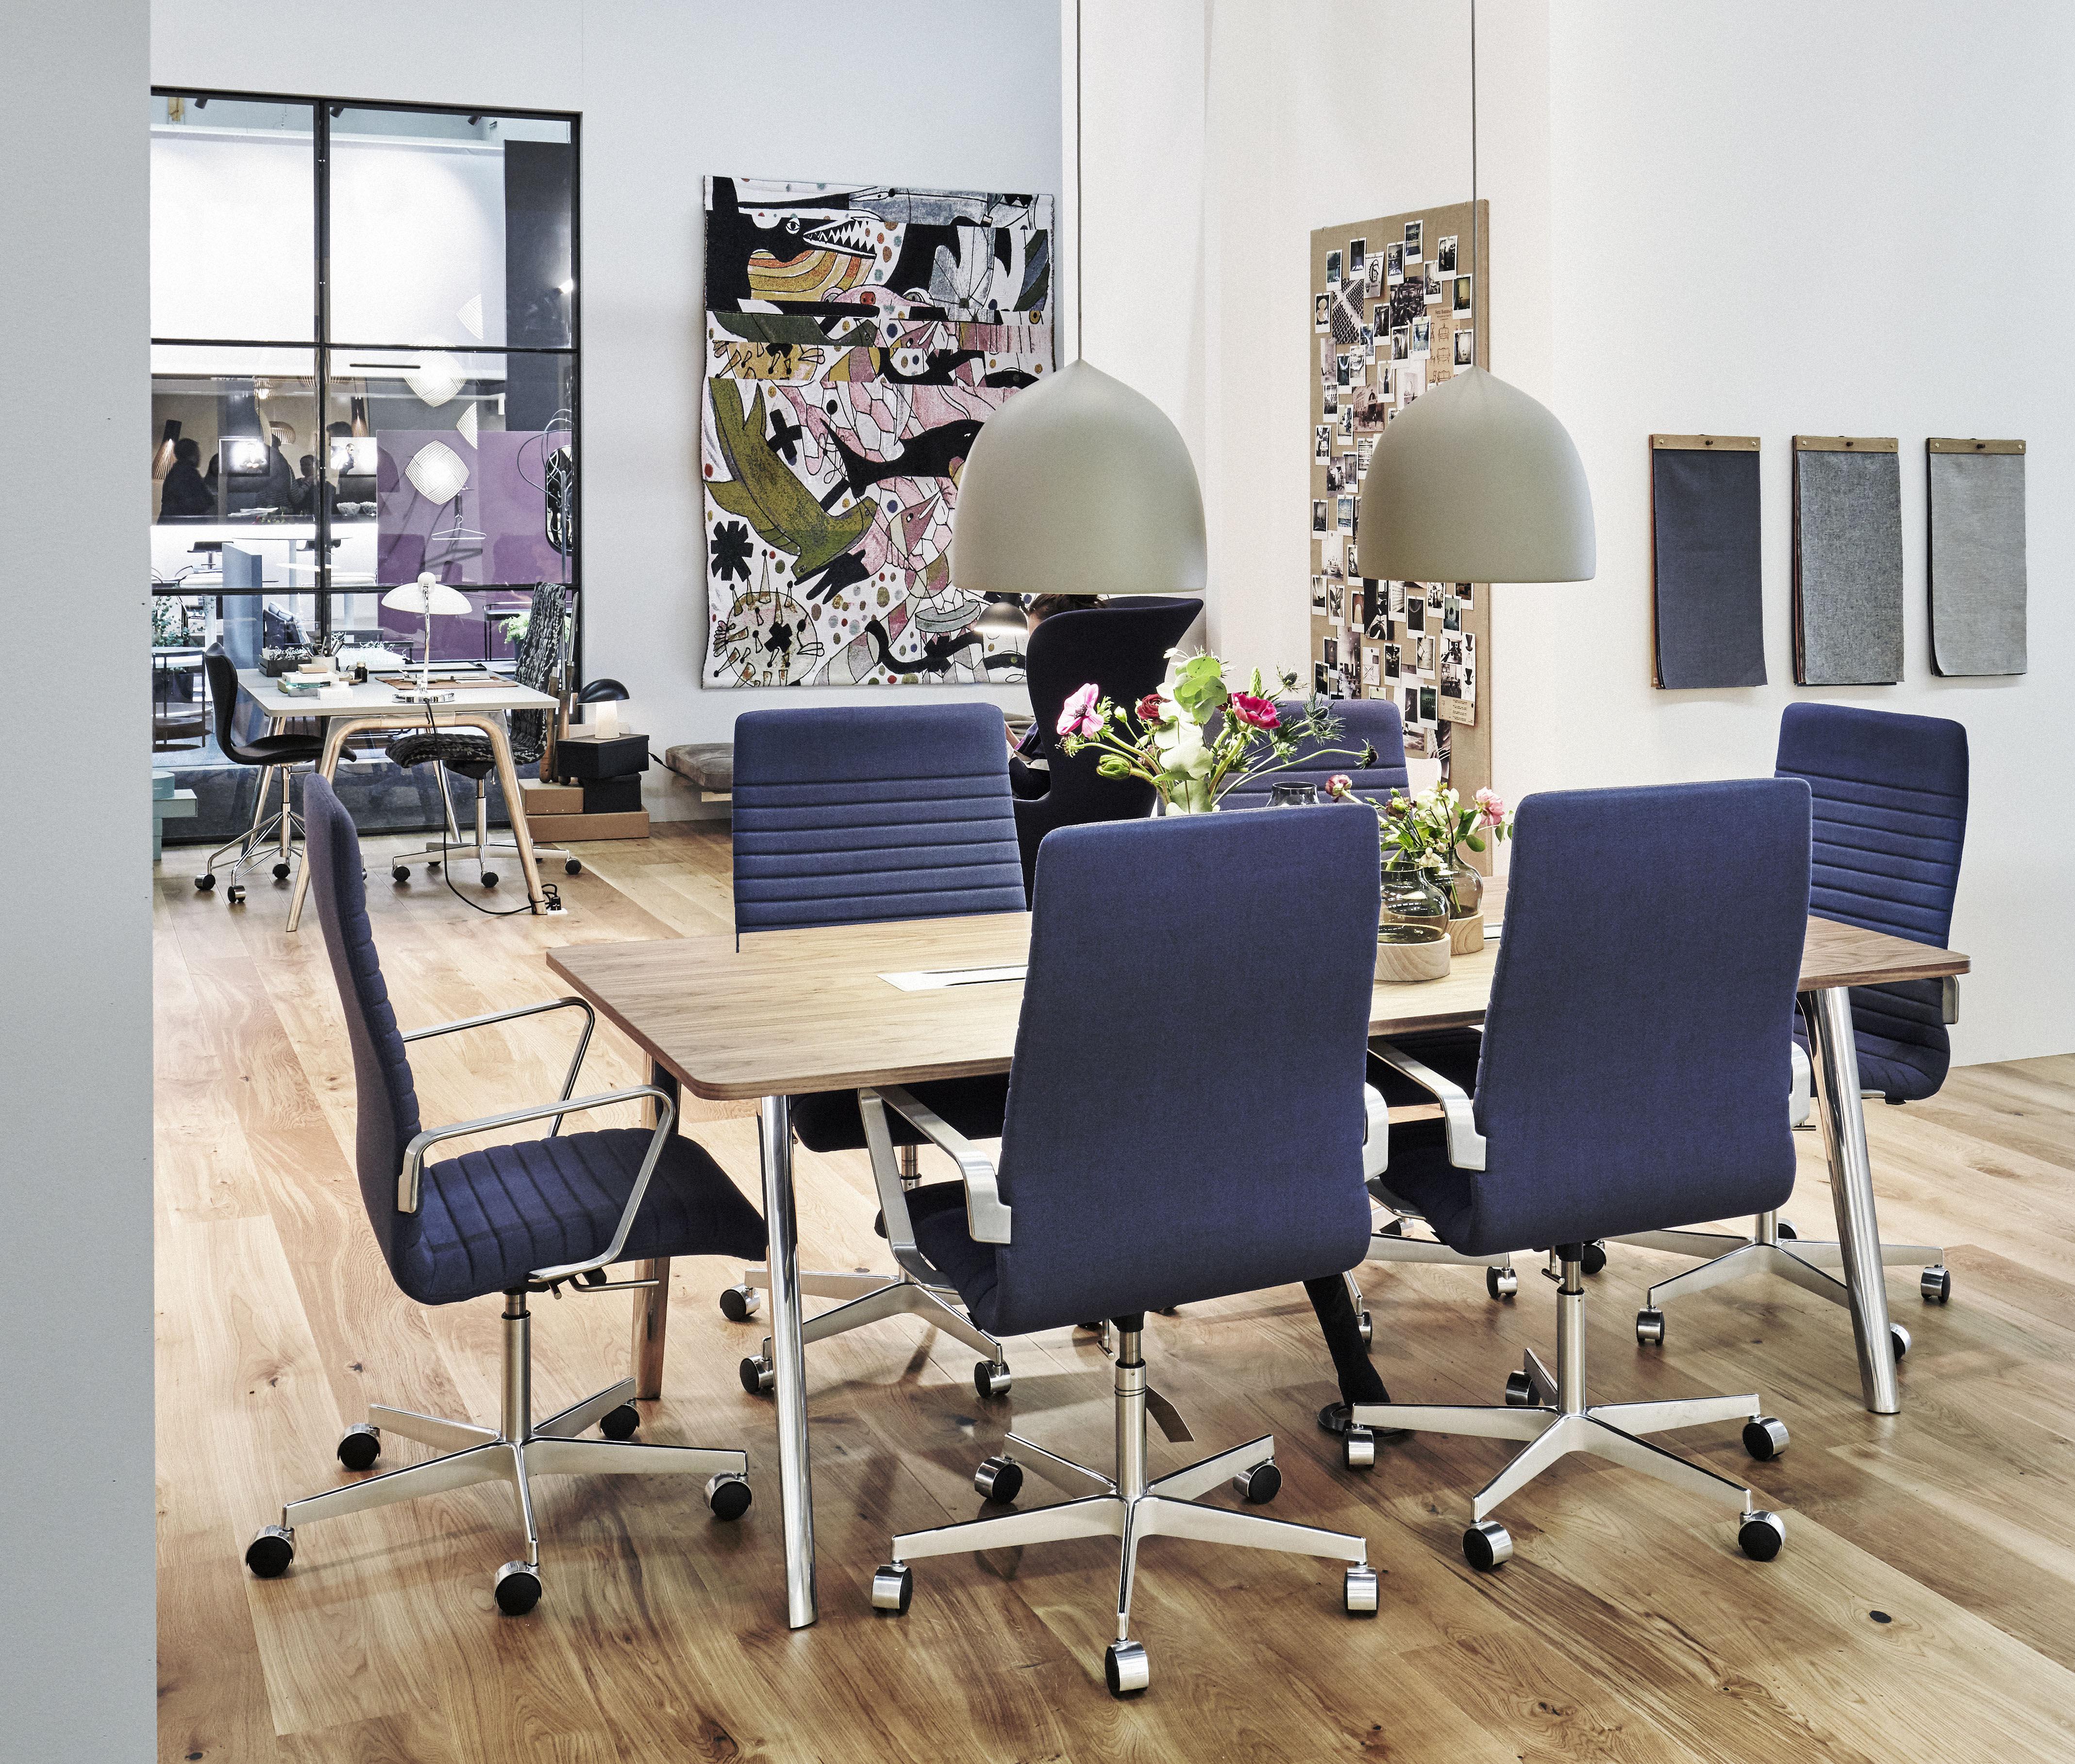 bureau pluralis bureau 200 x 100 cm ch ne ch ne pieds chrom s fritz hansen. Black Bedroom Furniture Sets. Home Design Ideas